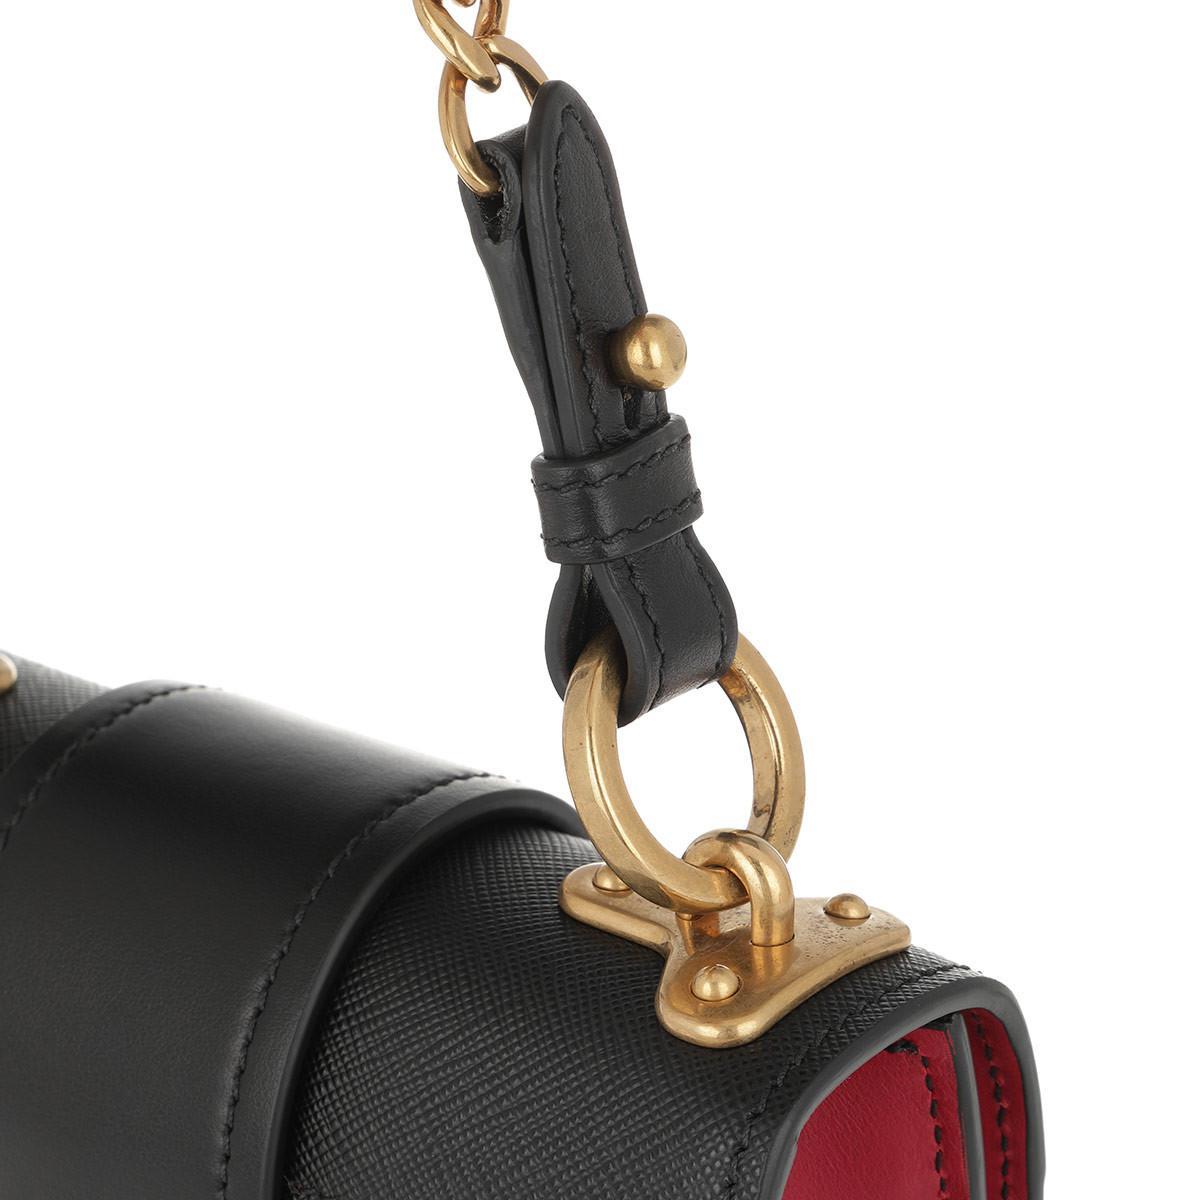 b5c101343a6fee Prada Pionnière Bag Calf/saffiano Medium Fuoco/nero in Black - Lyst